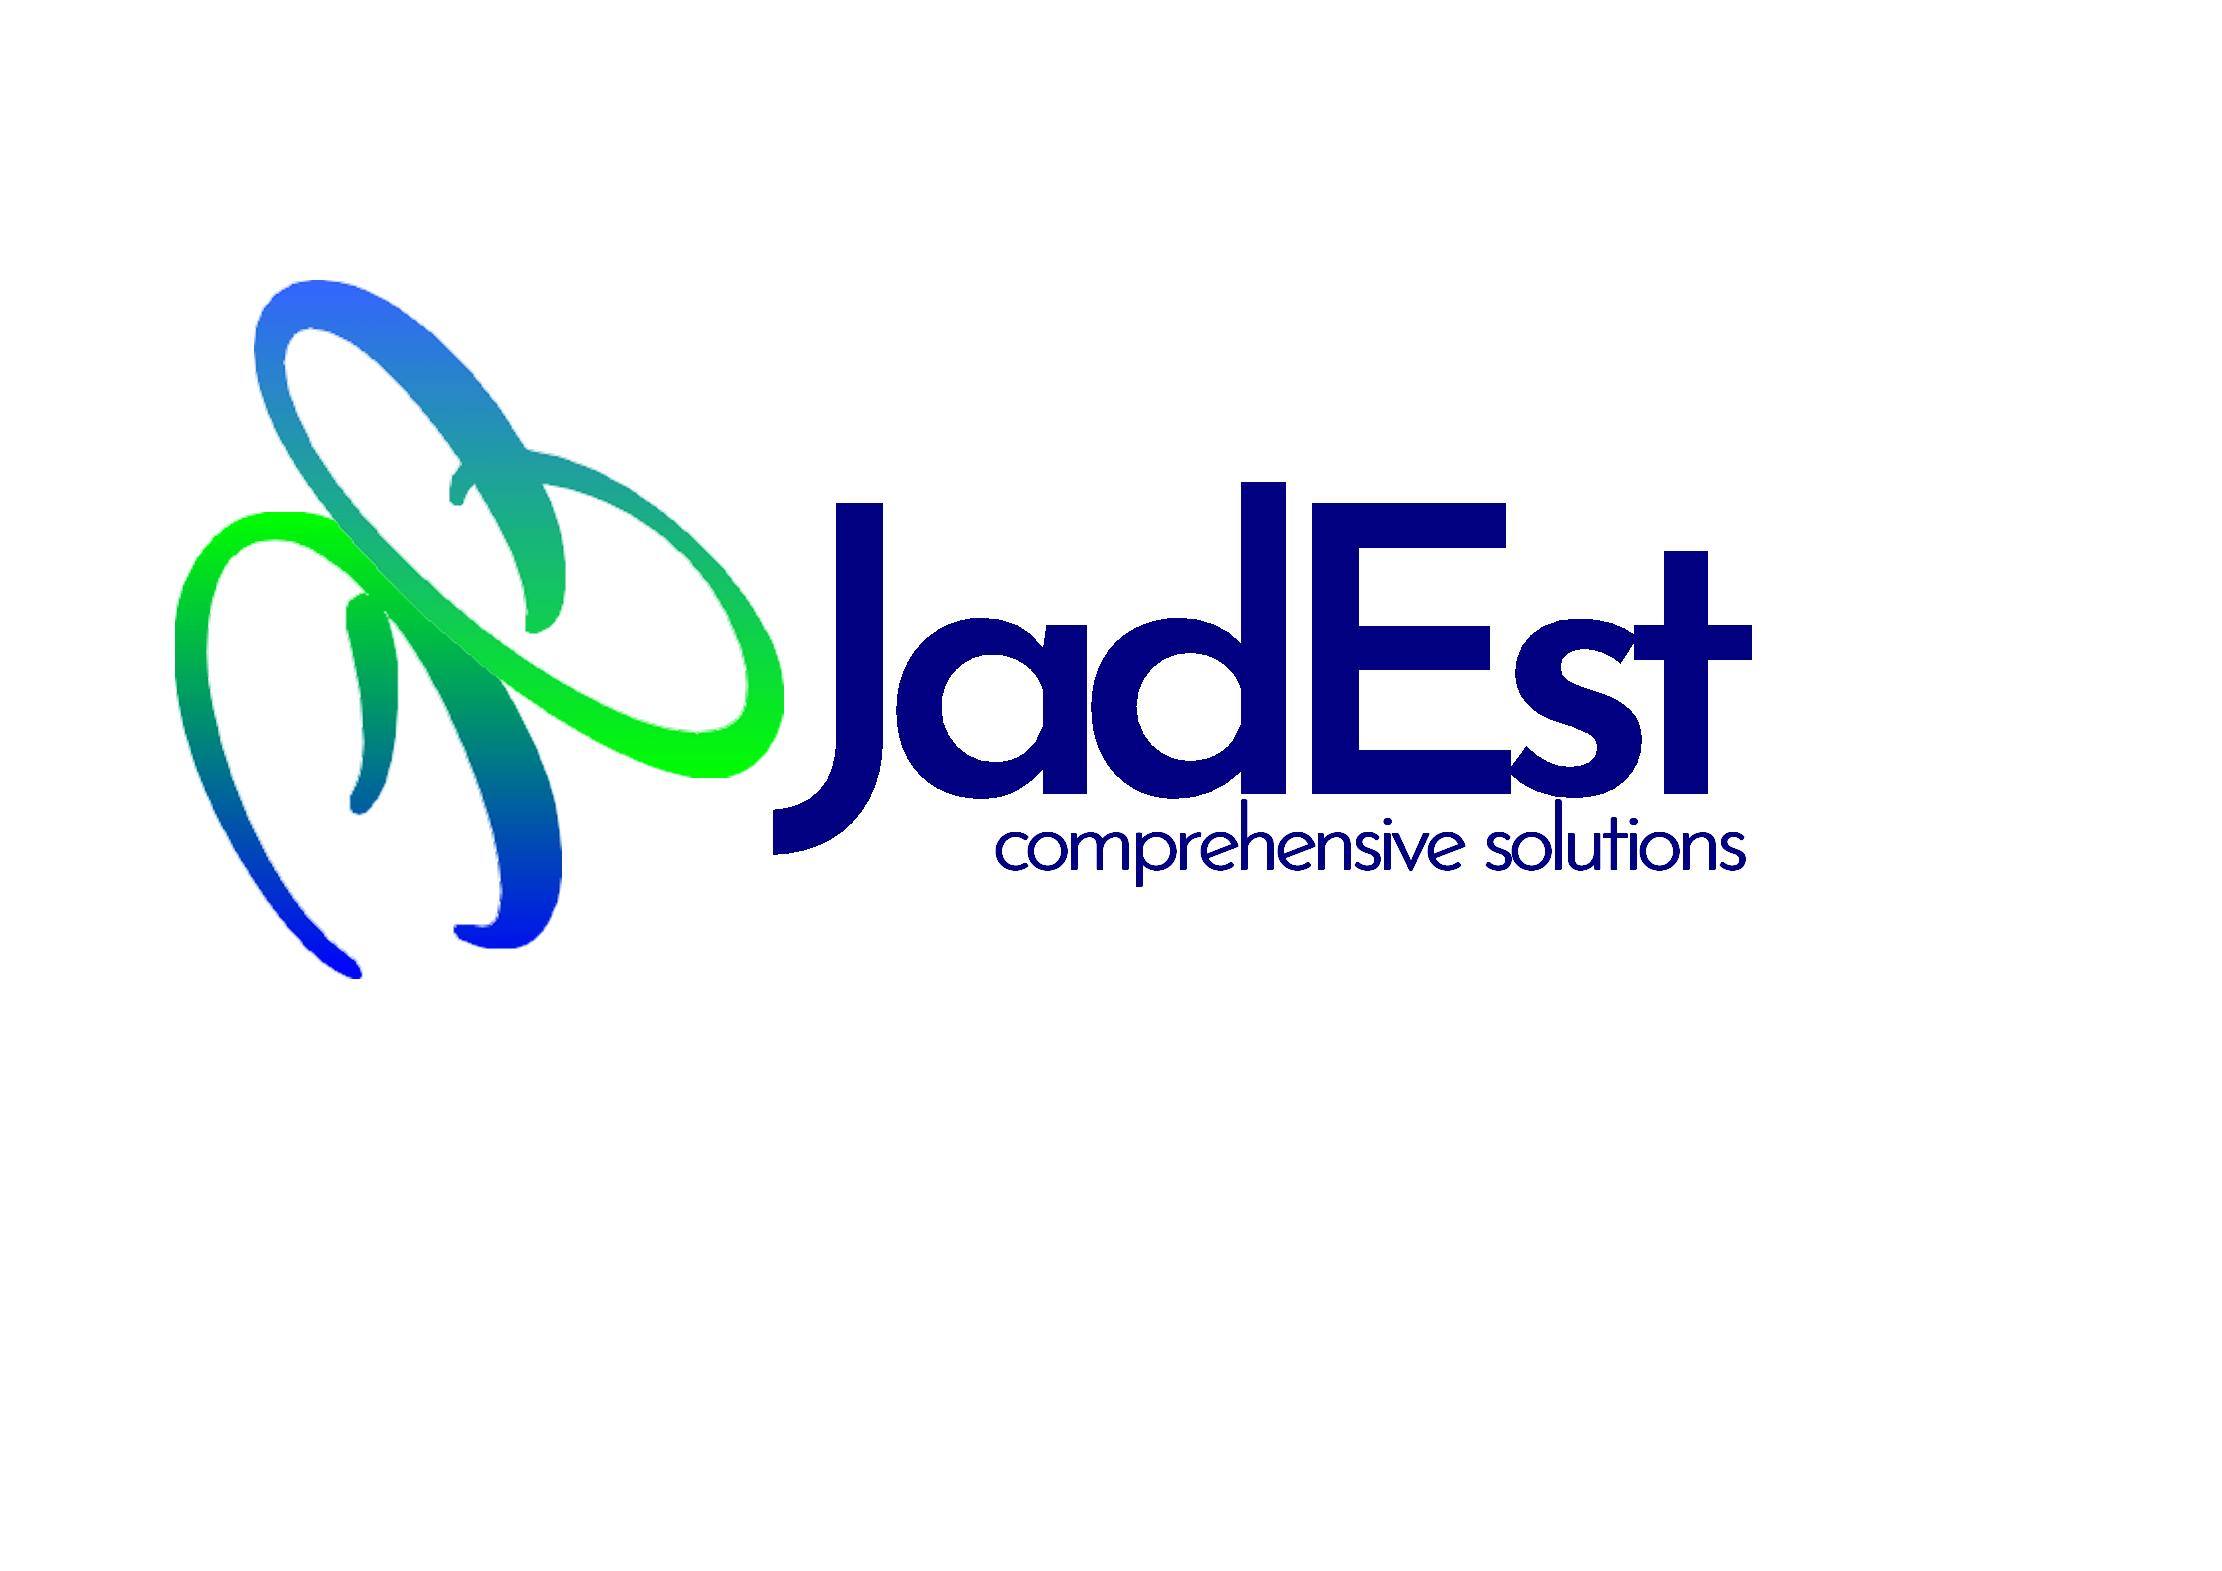 Logo jadest comprehensive solutions